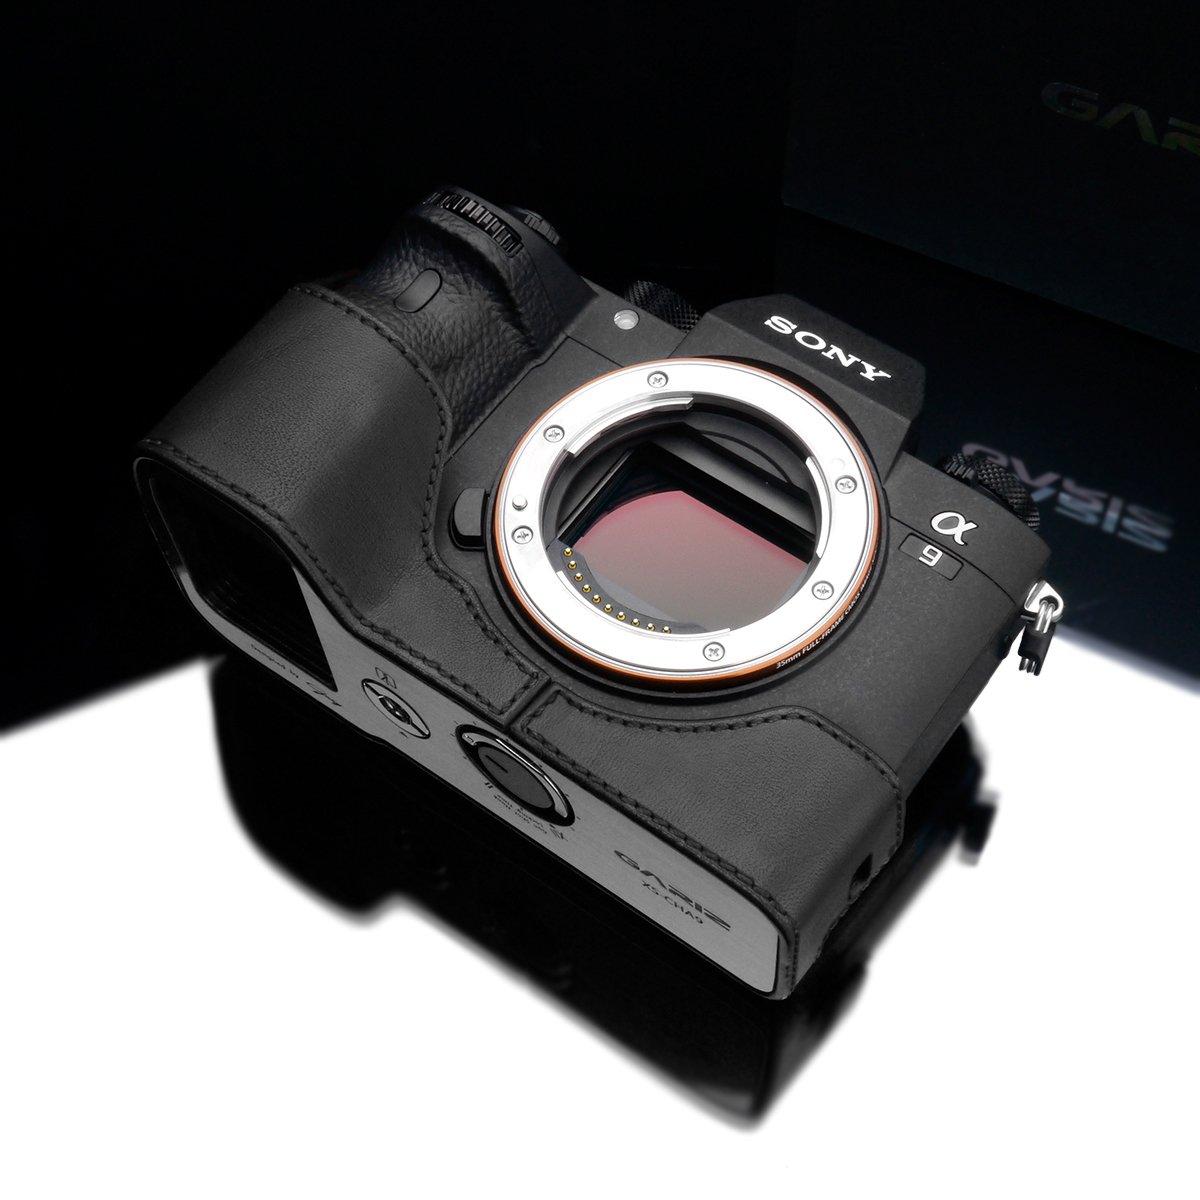 Gariz Xs Cha9bk Genuine Leather Half Case For Sony A9 L Plate Bracket Shape Kamera A7 A7r A7s Mark Ii Mark2 Iii Black Electronics